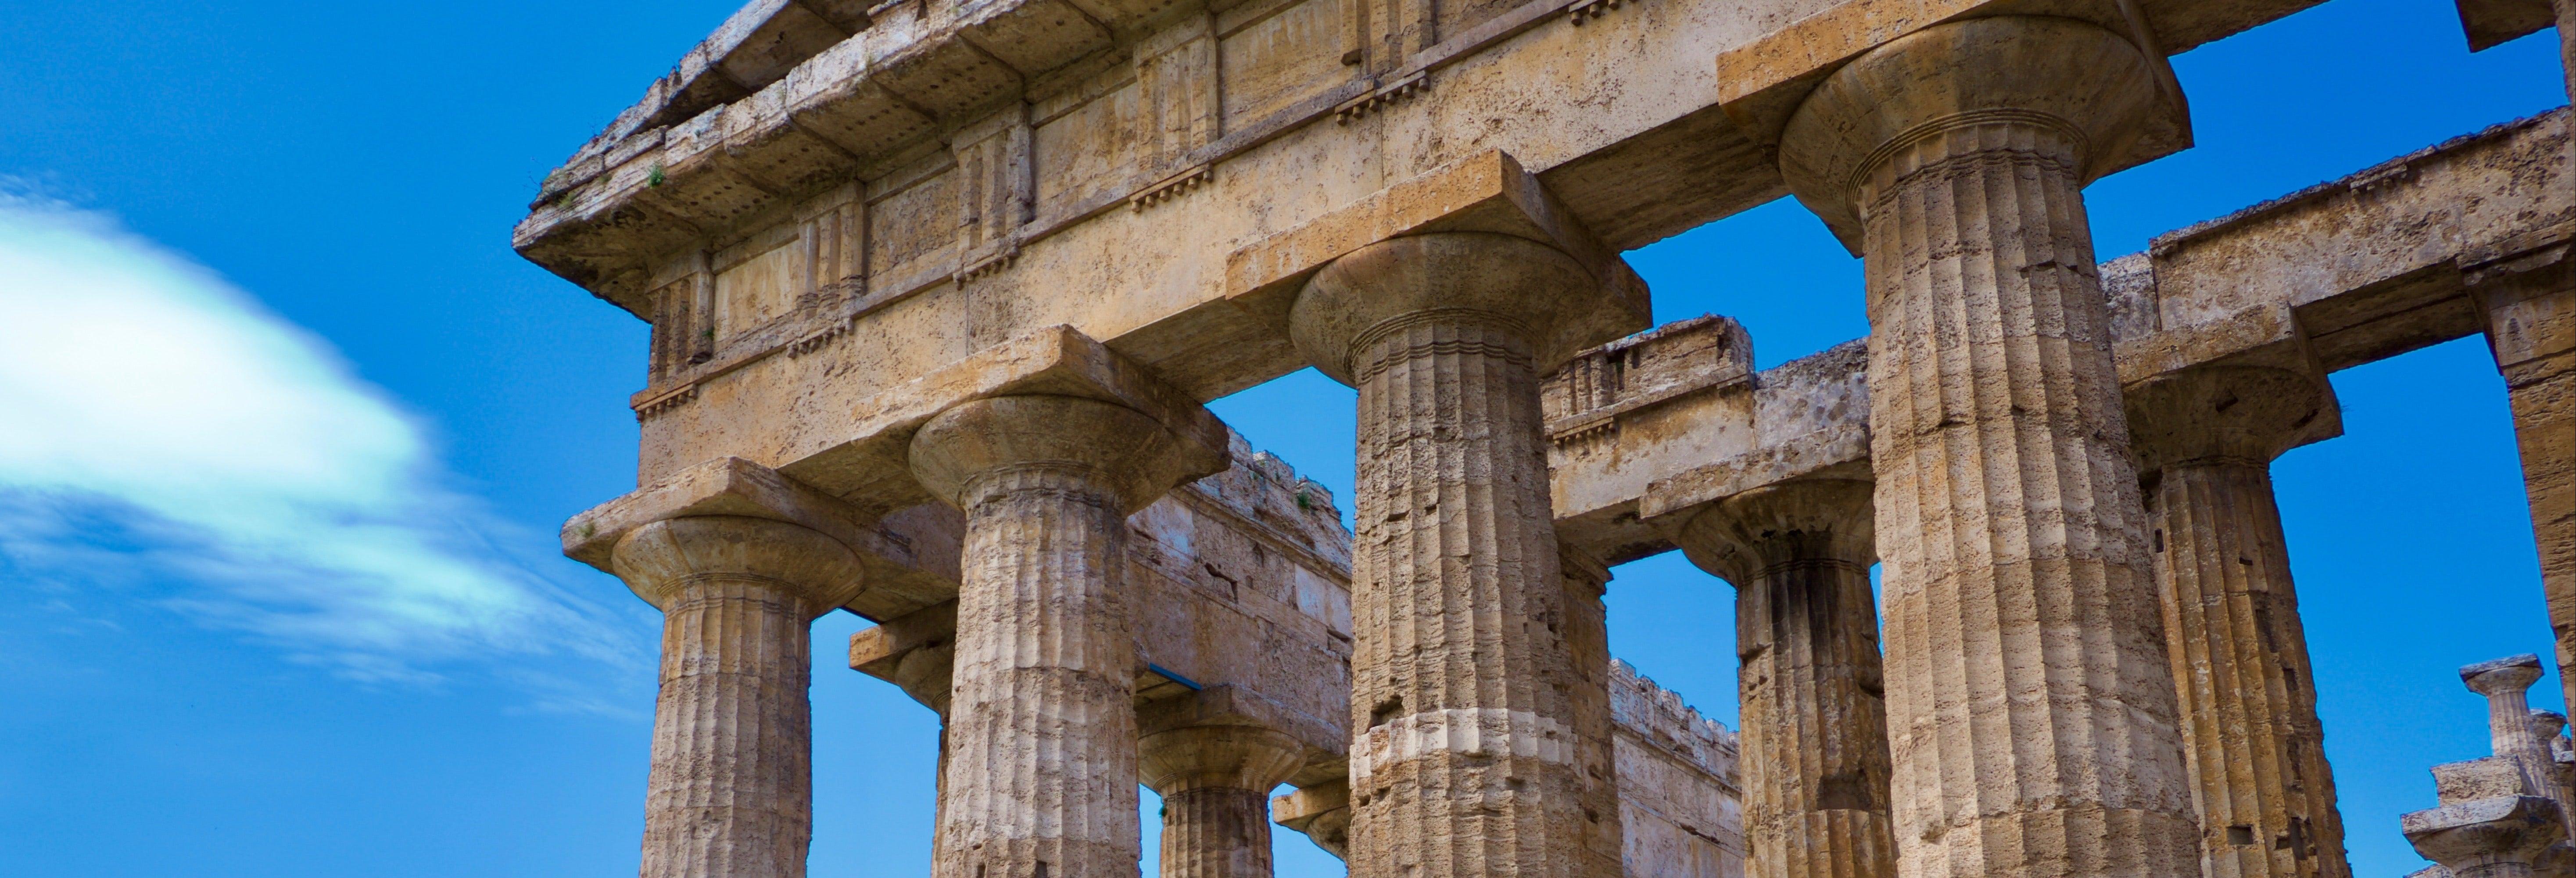 Excursion à Paestum